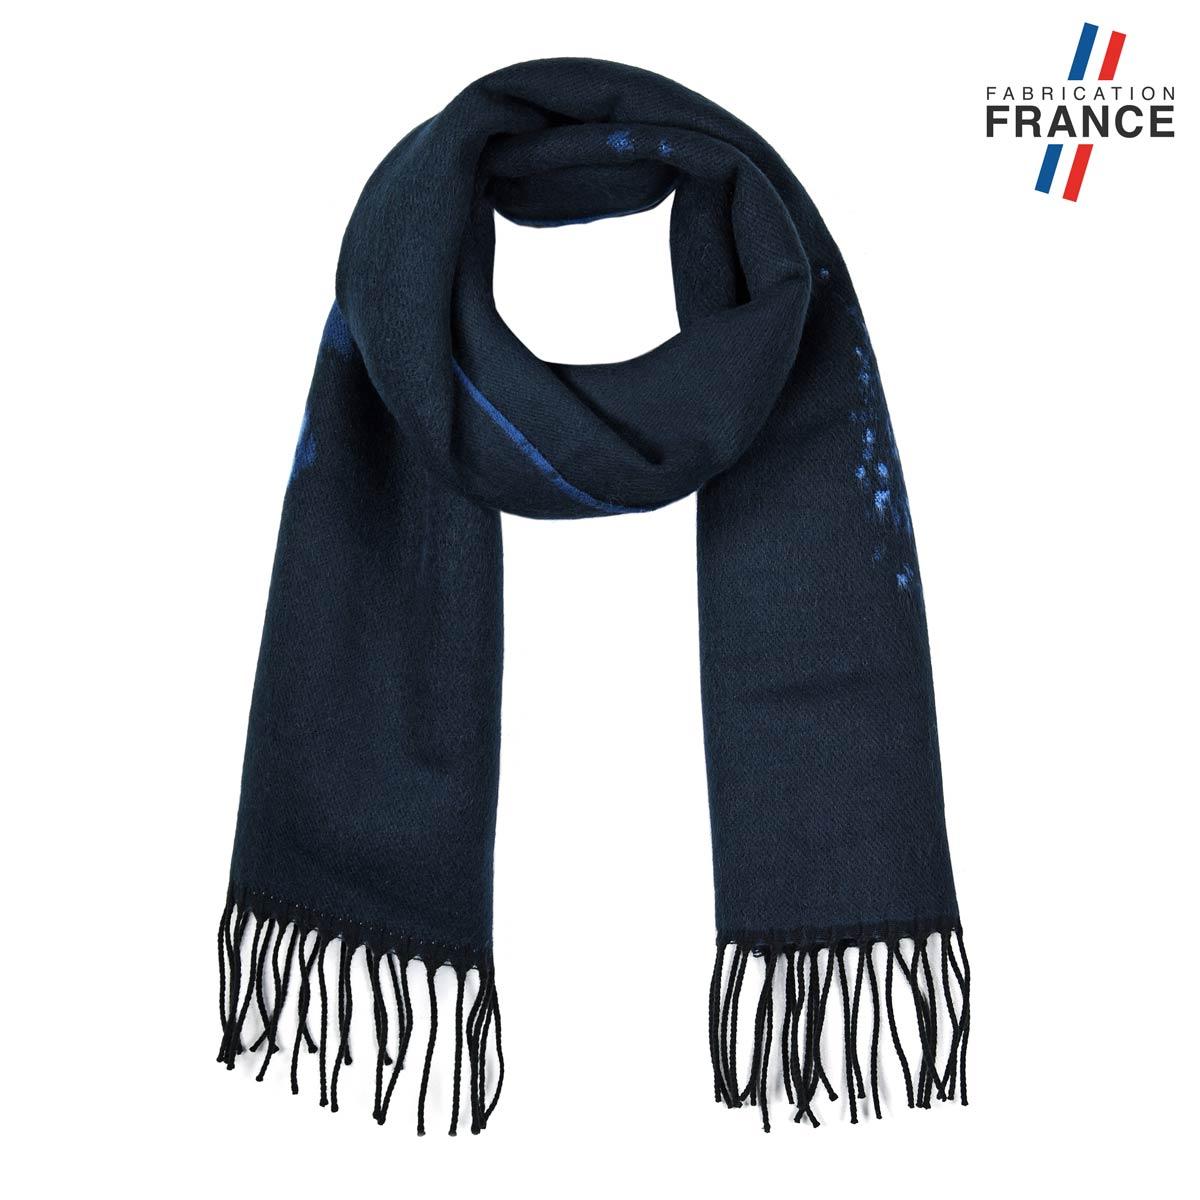 AT-05791_F12-1FR_Echarpe-femme-bleu-metal-fabrication-francaise